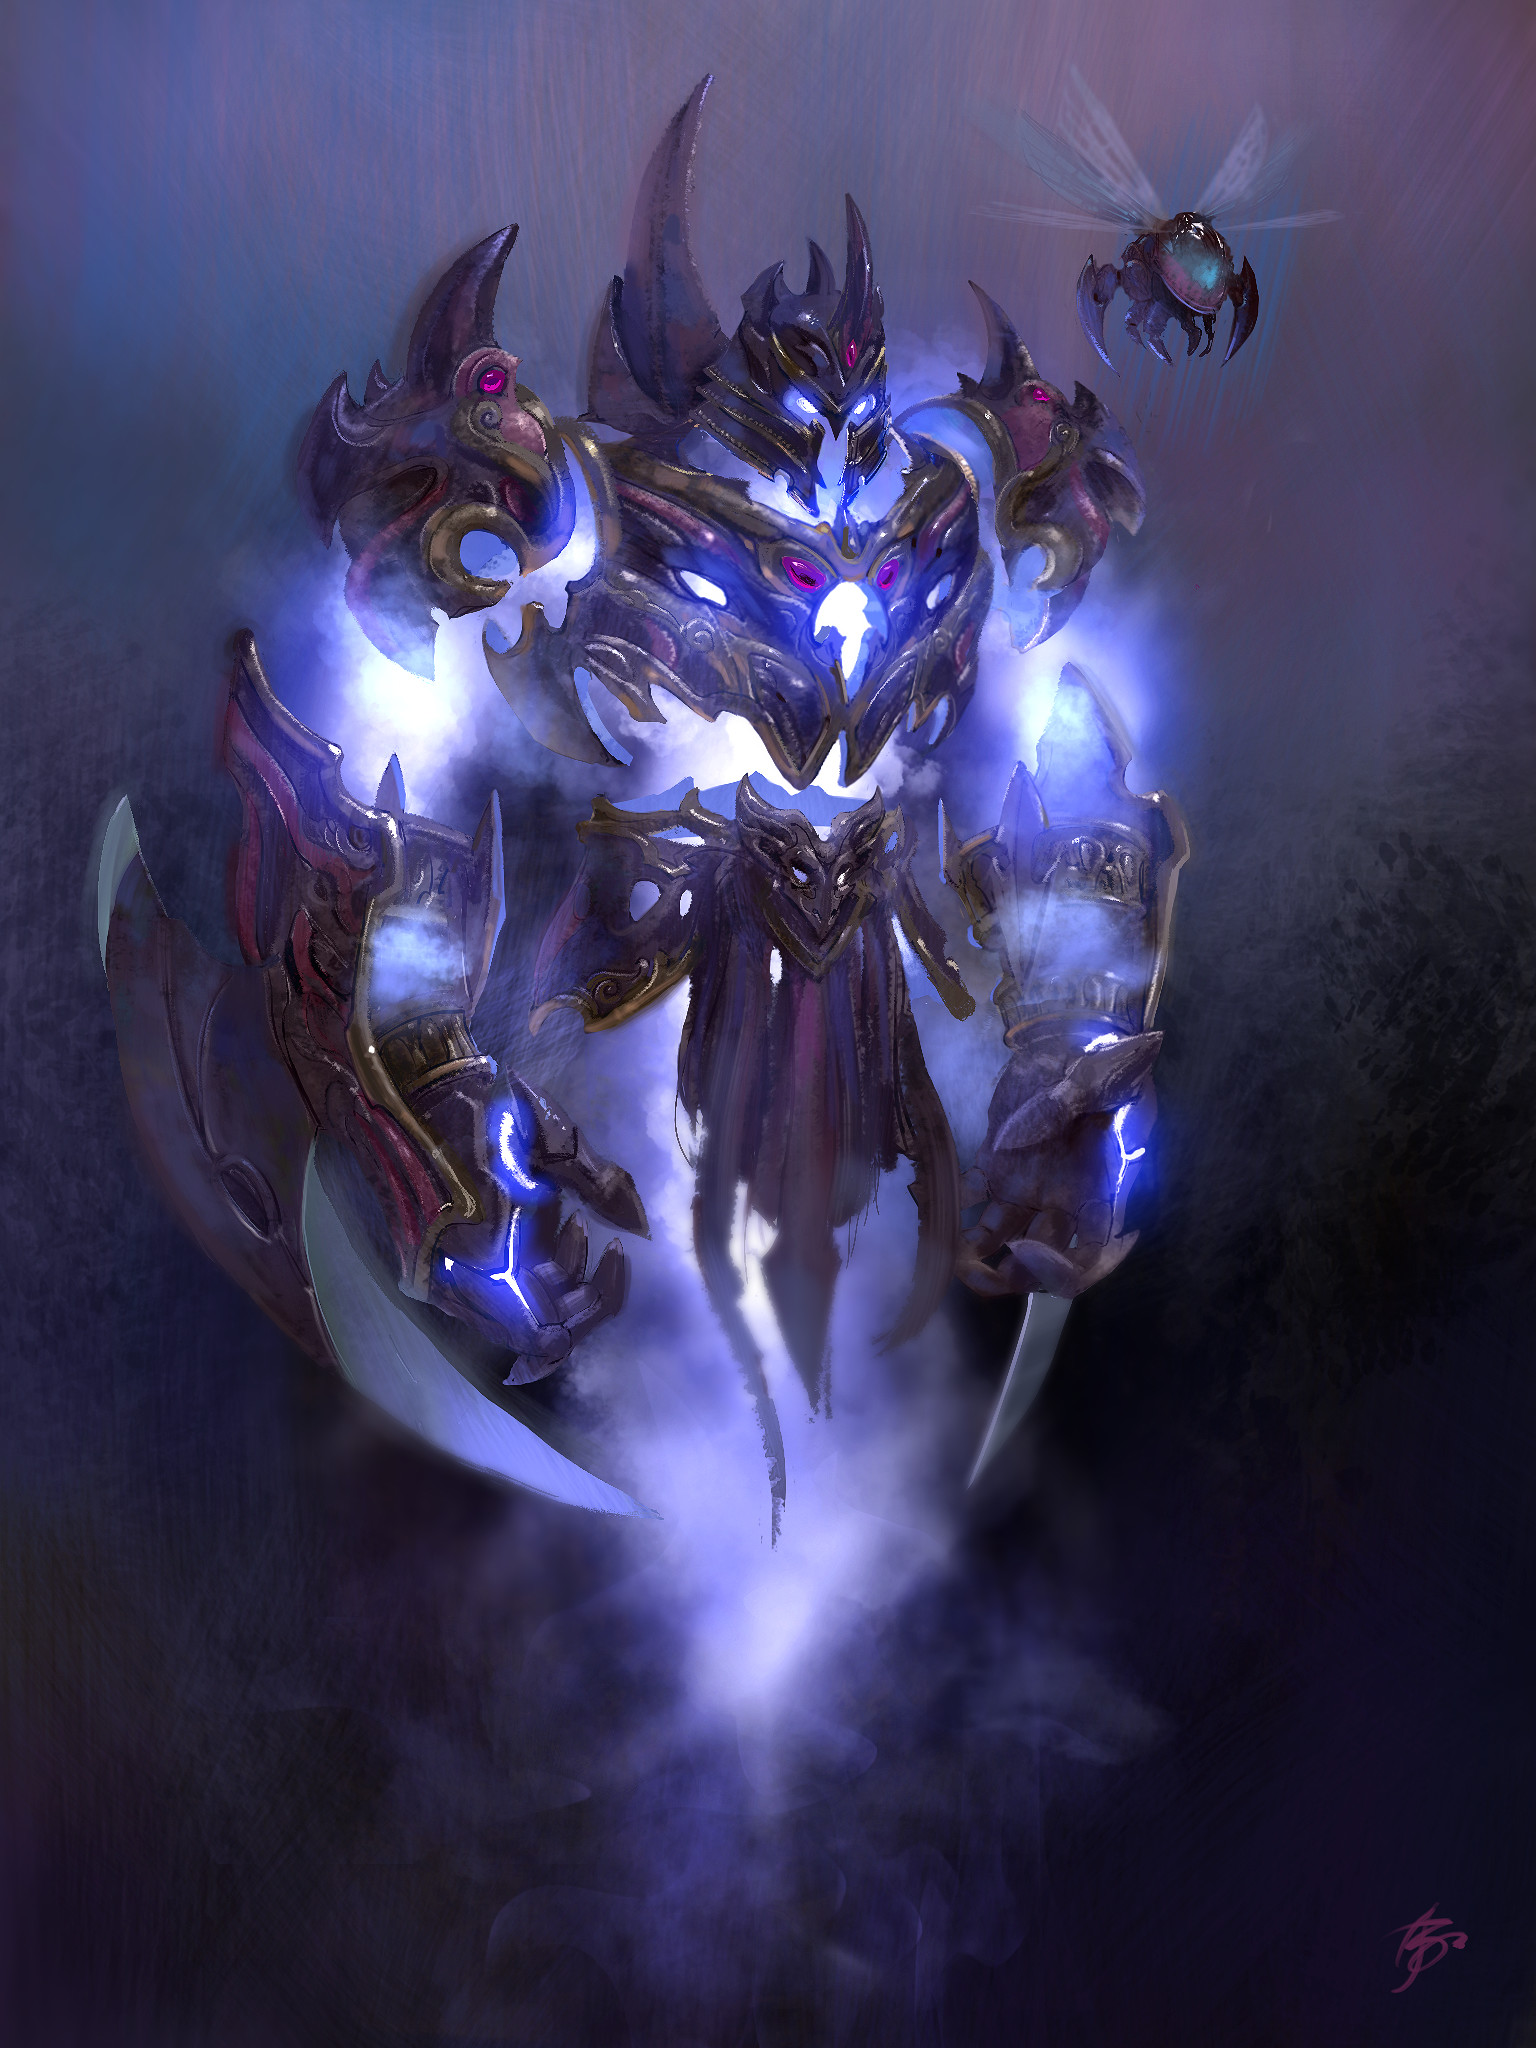 allen-song-armored-spirit.jpg